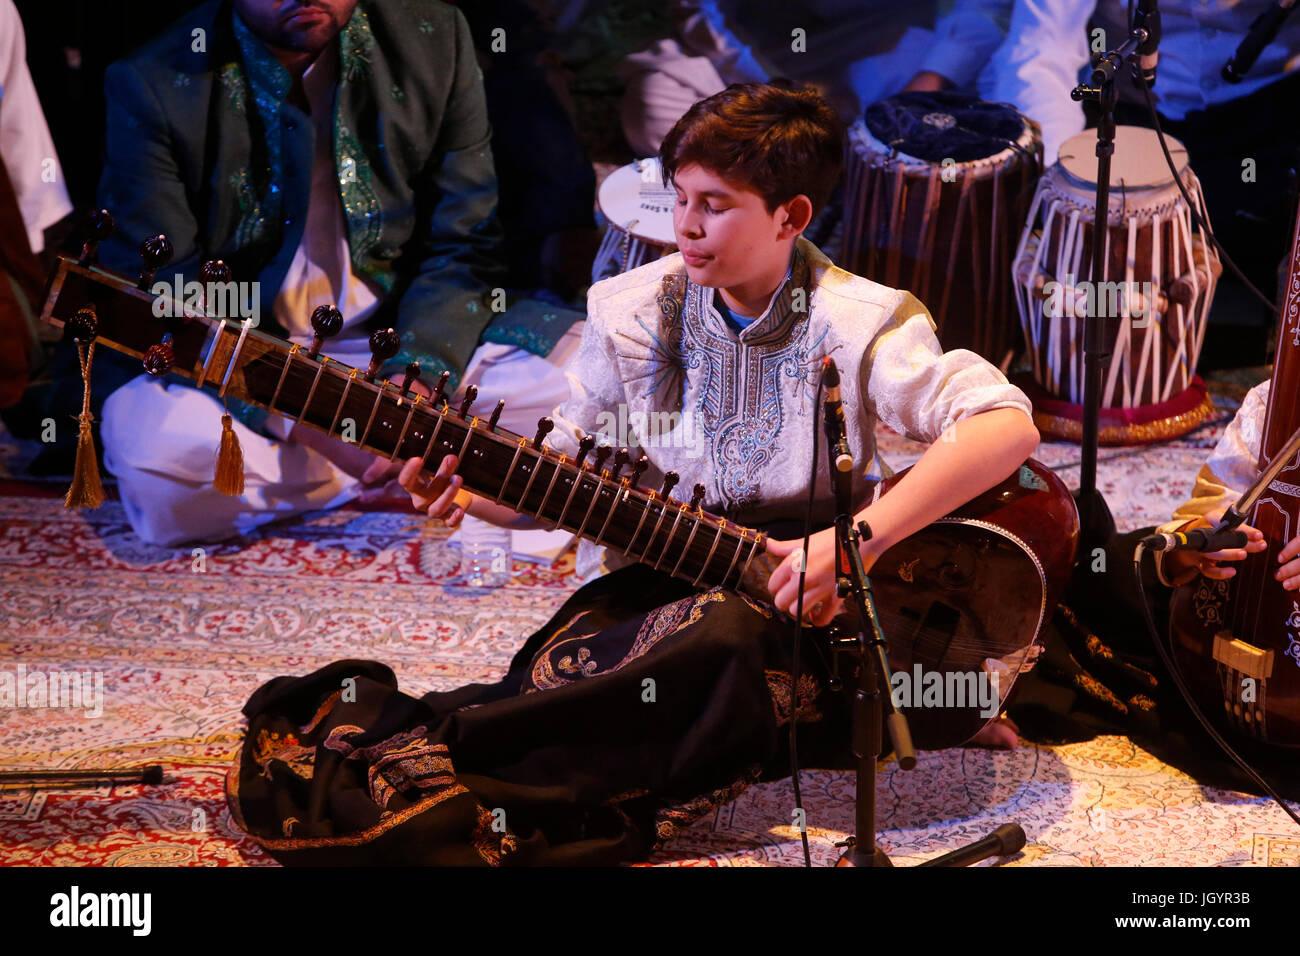 Grand Mawlid de Paris sufi gathering and celebration. Shuaib Mushtaq Qawal musicians (India/Pakistan). France. - Stock Image